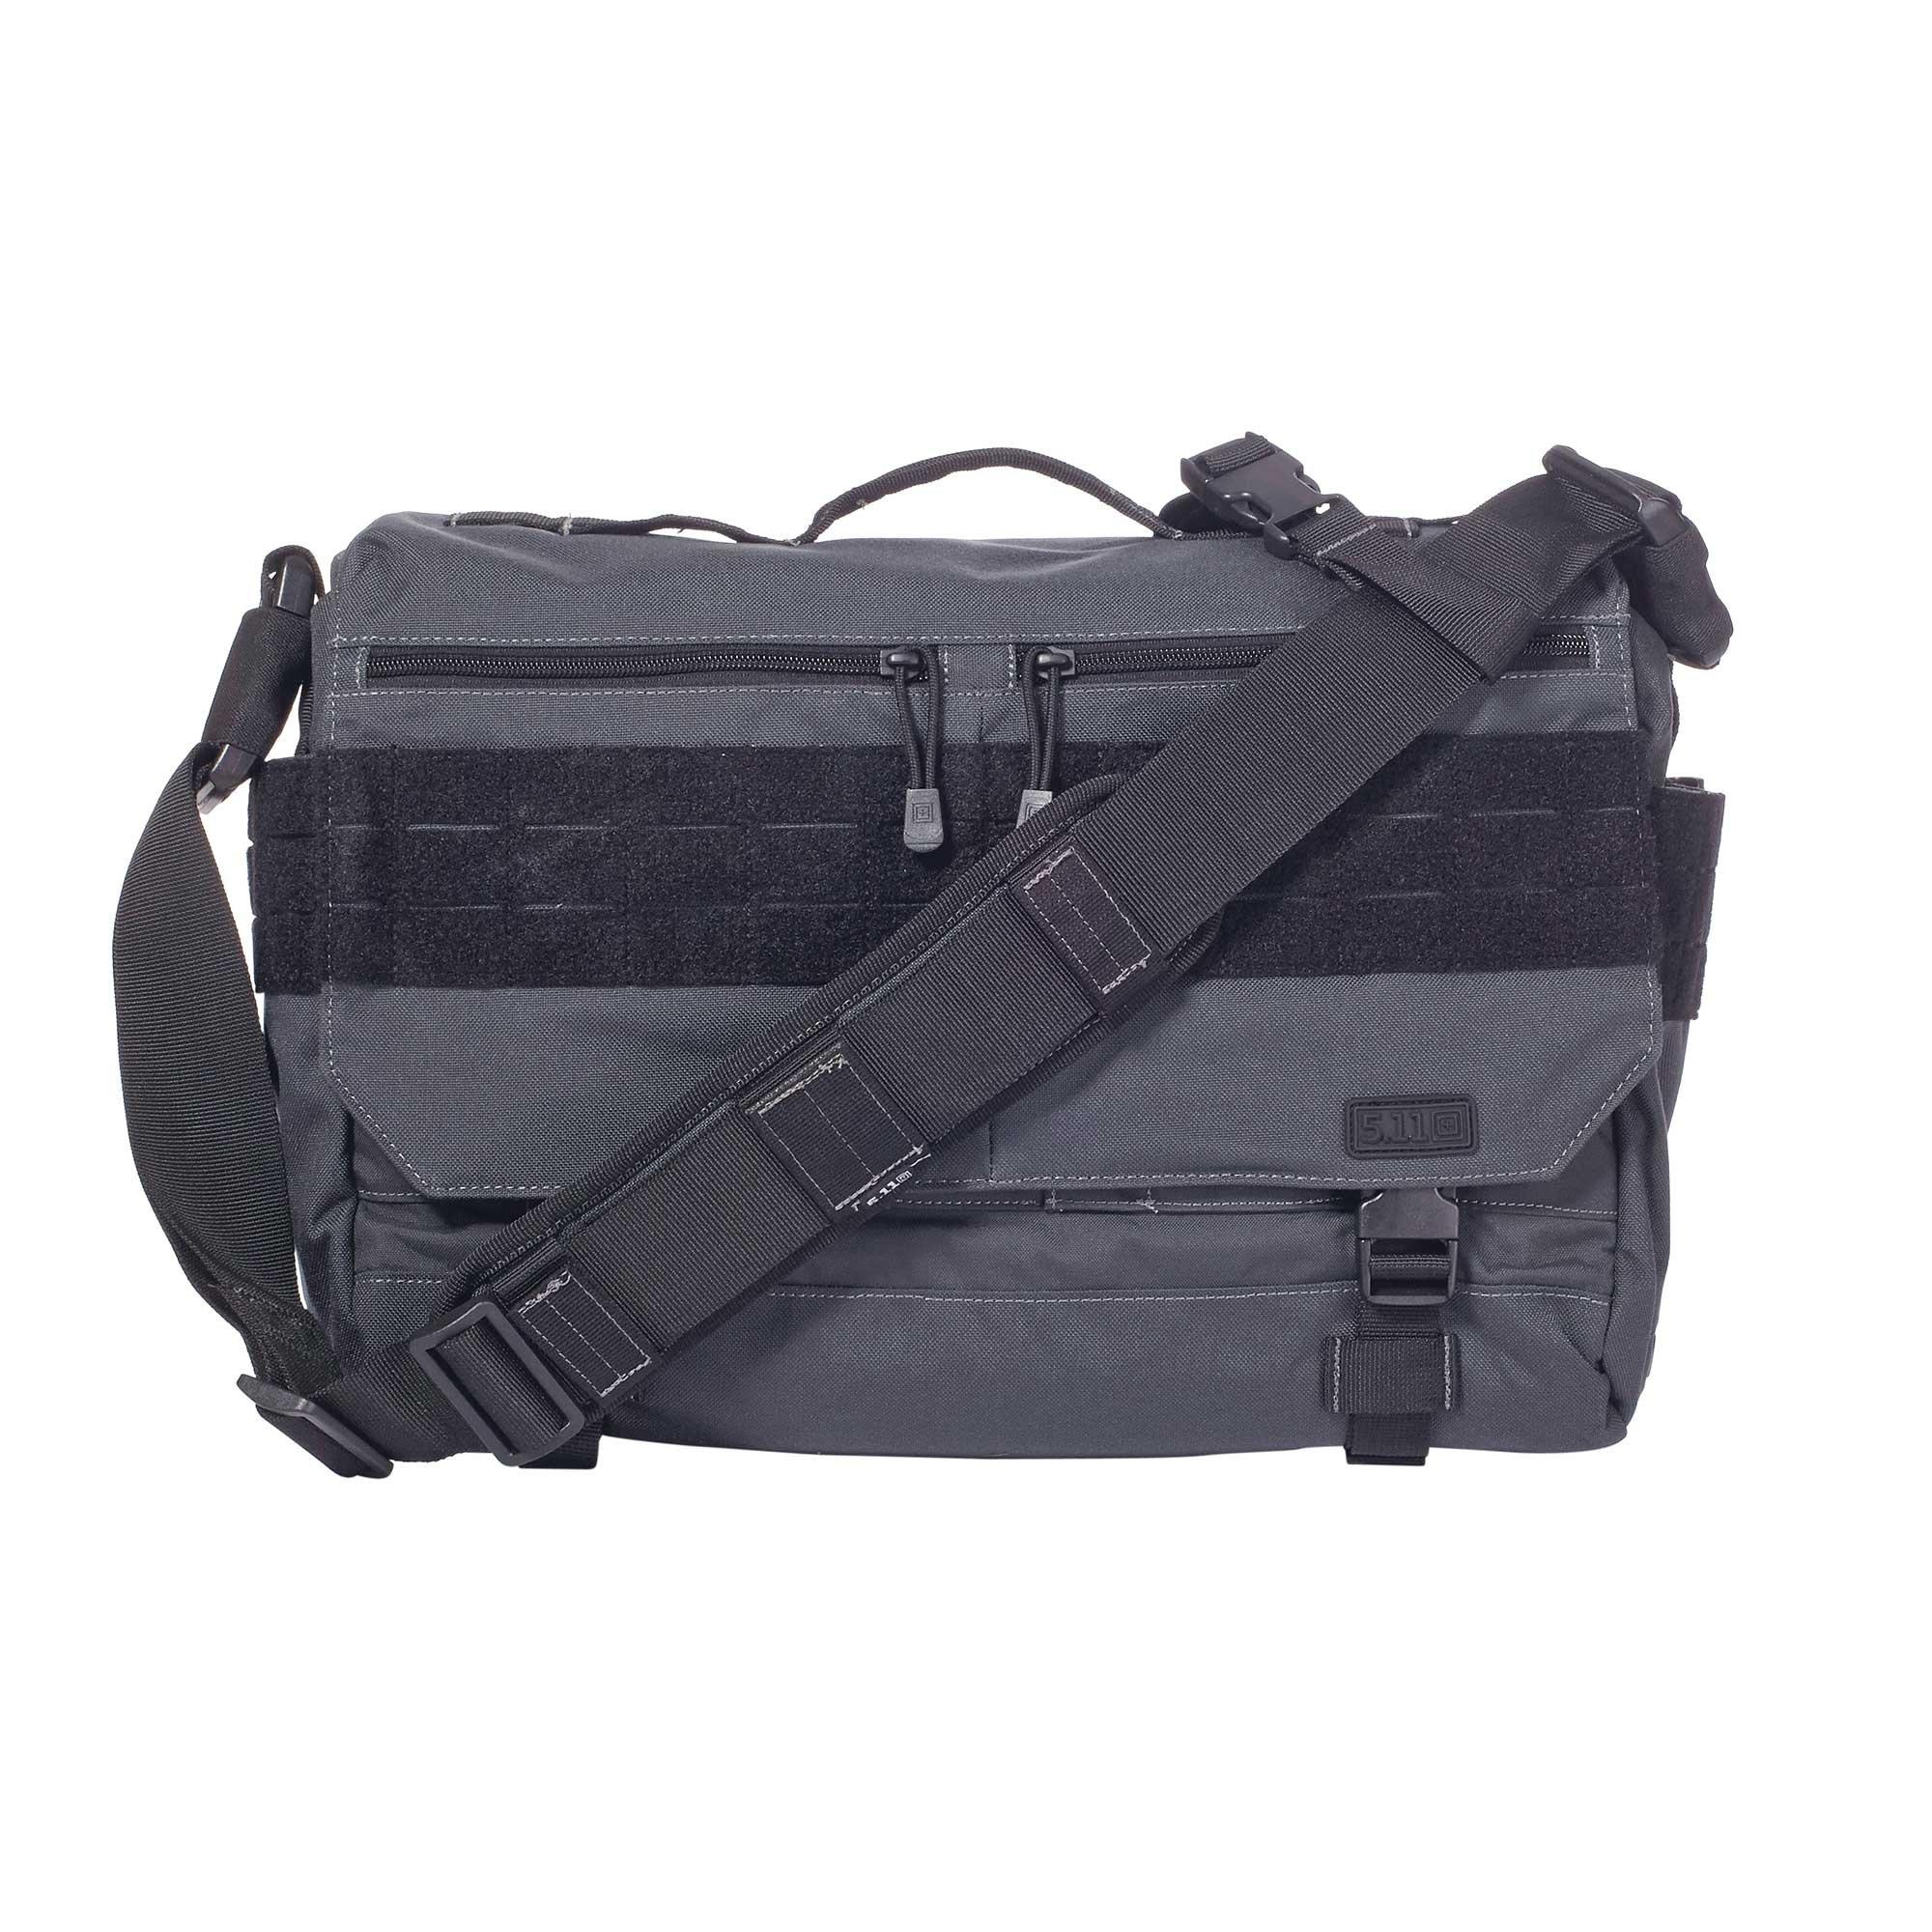 a82e7e4fcc0a 5.11 Rush Delivery Multi-function Tactical Messenger Bag